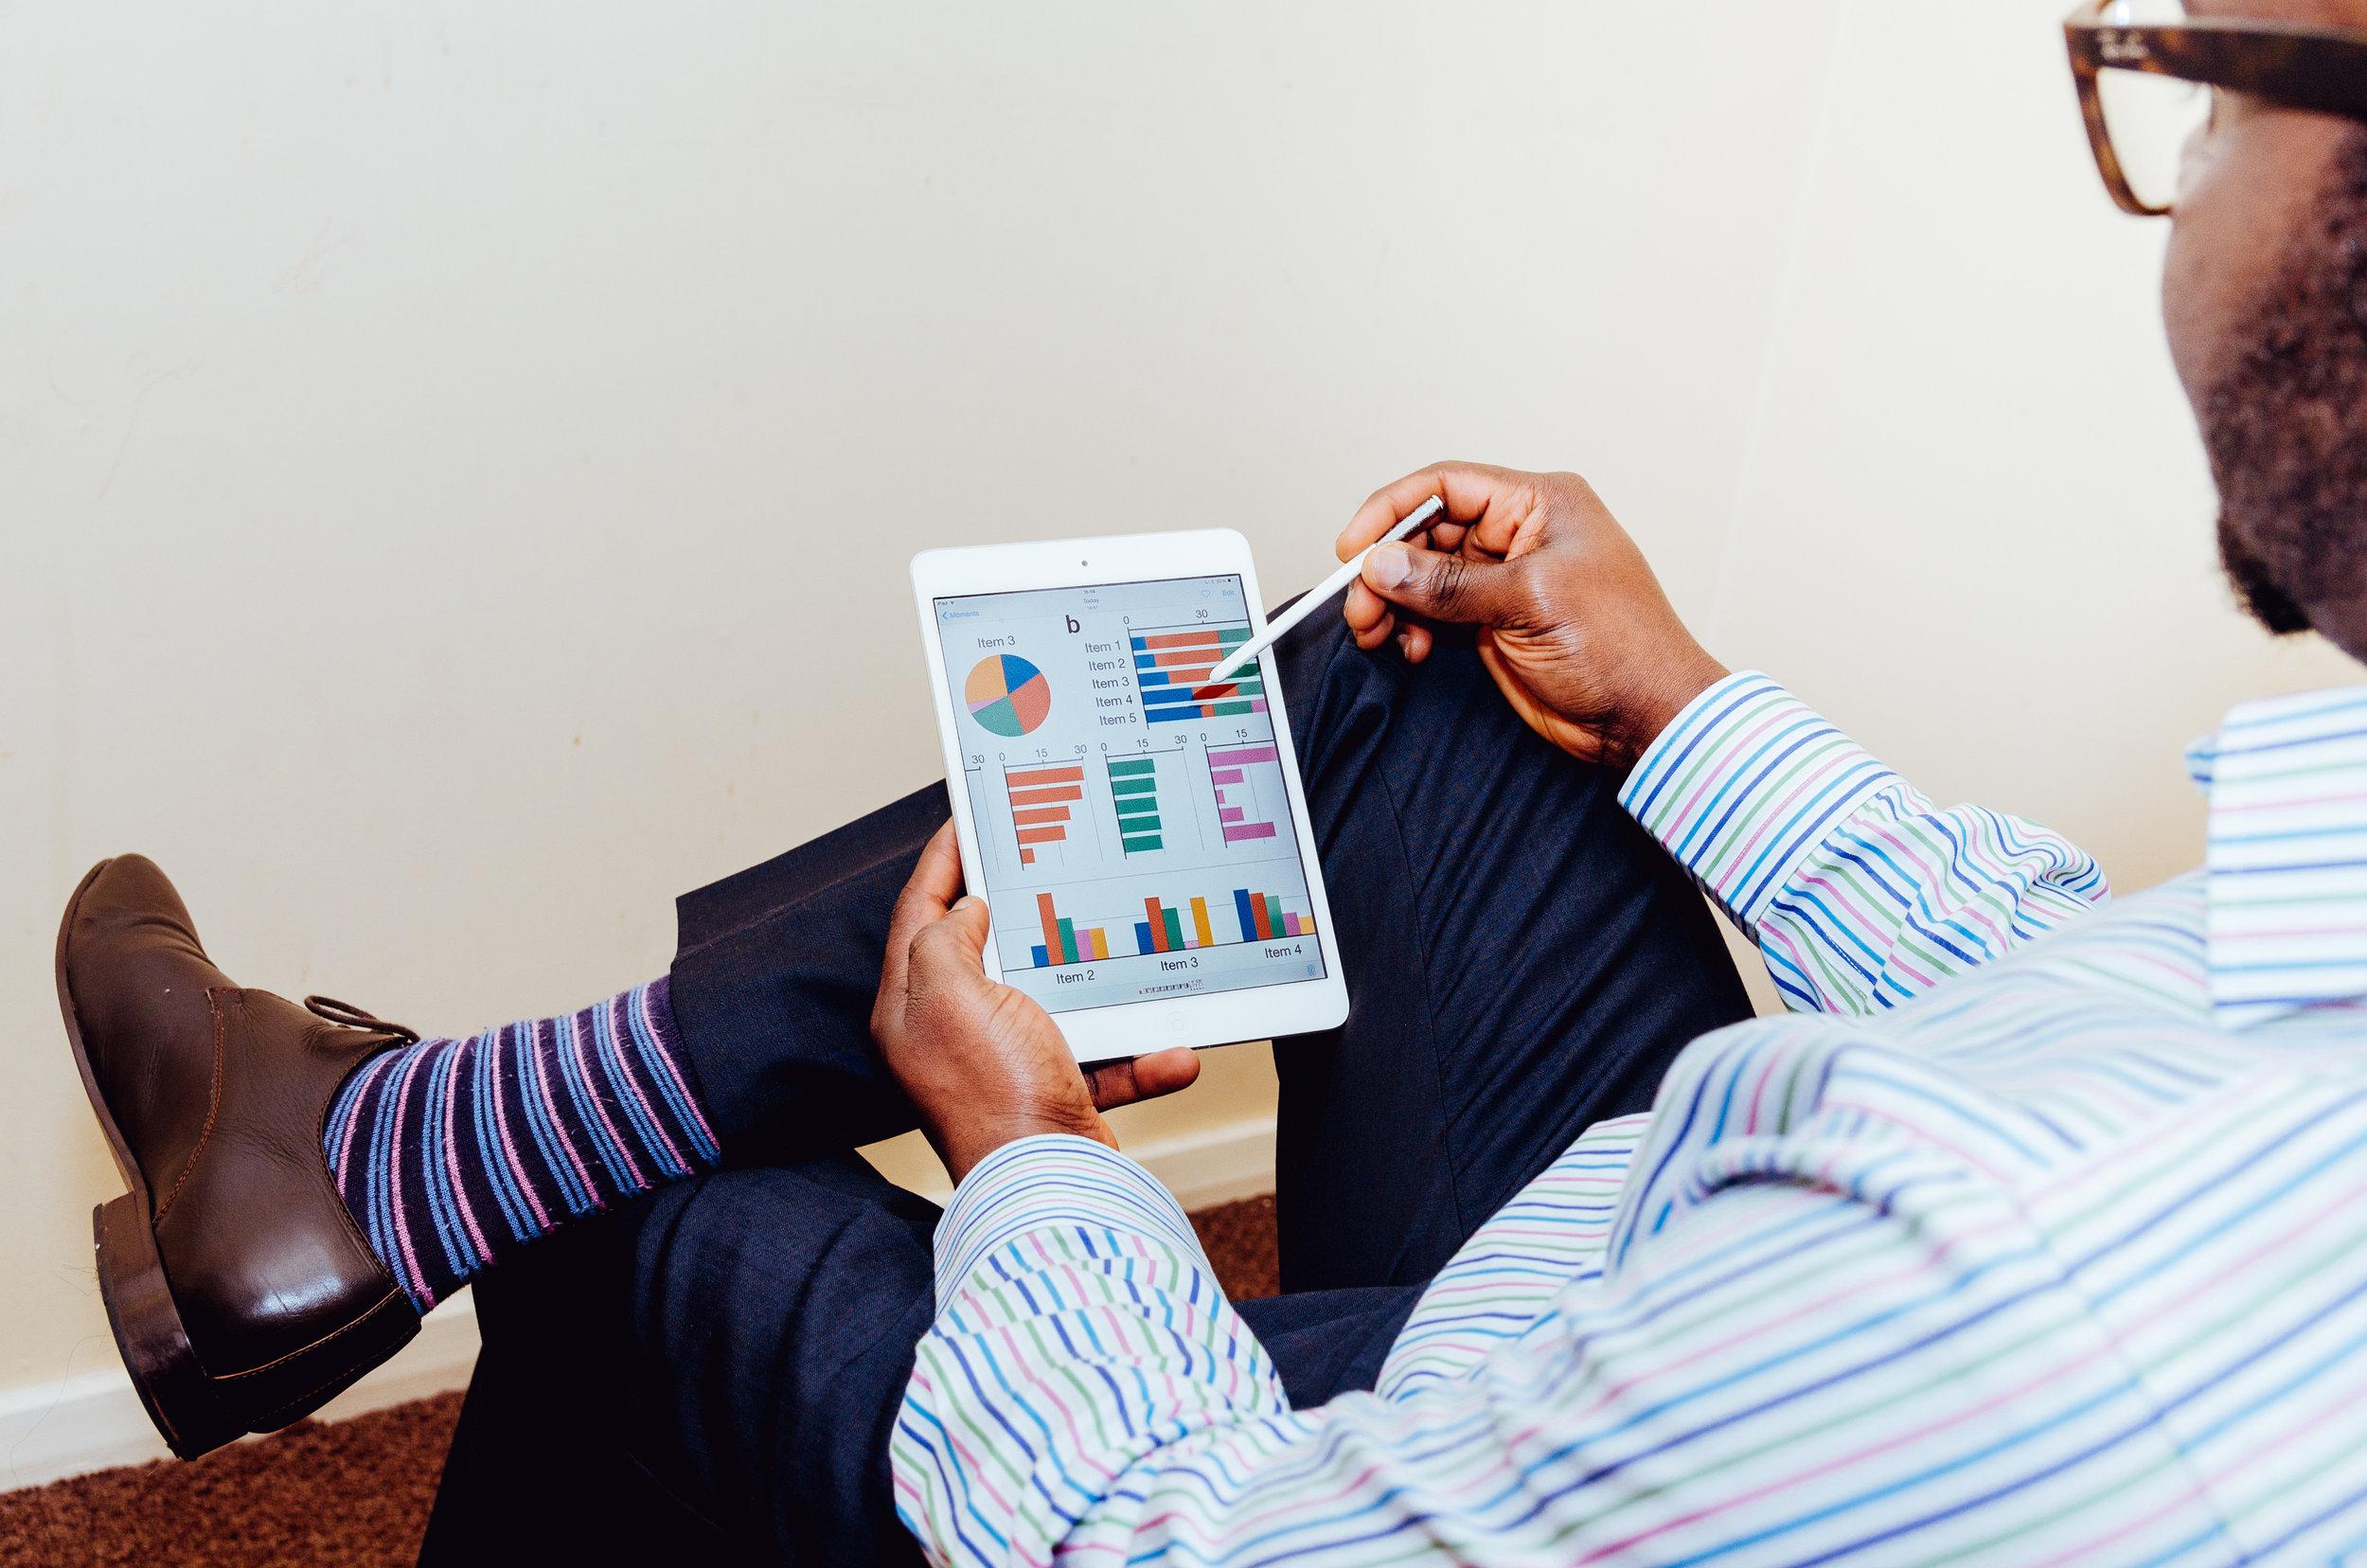 Digitalizing Finance - since 2017